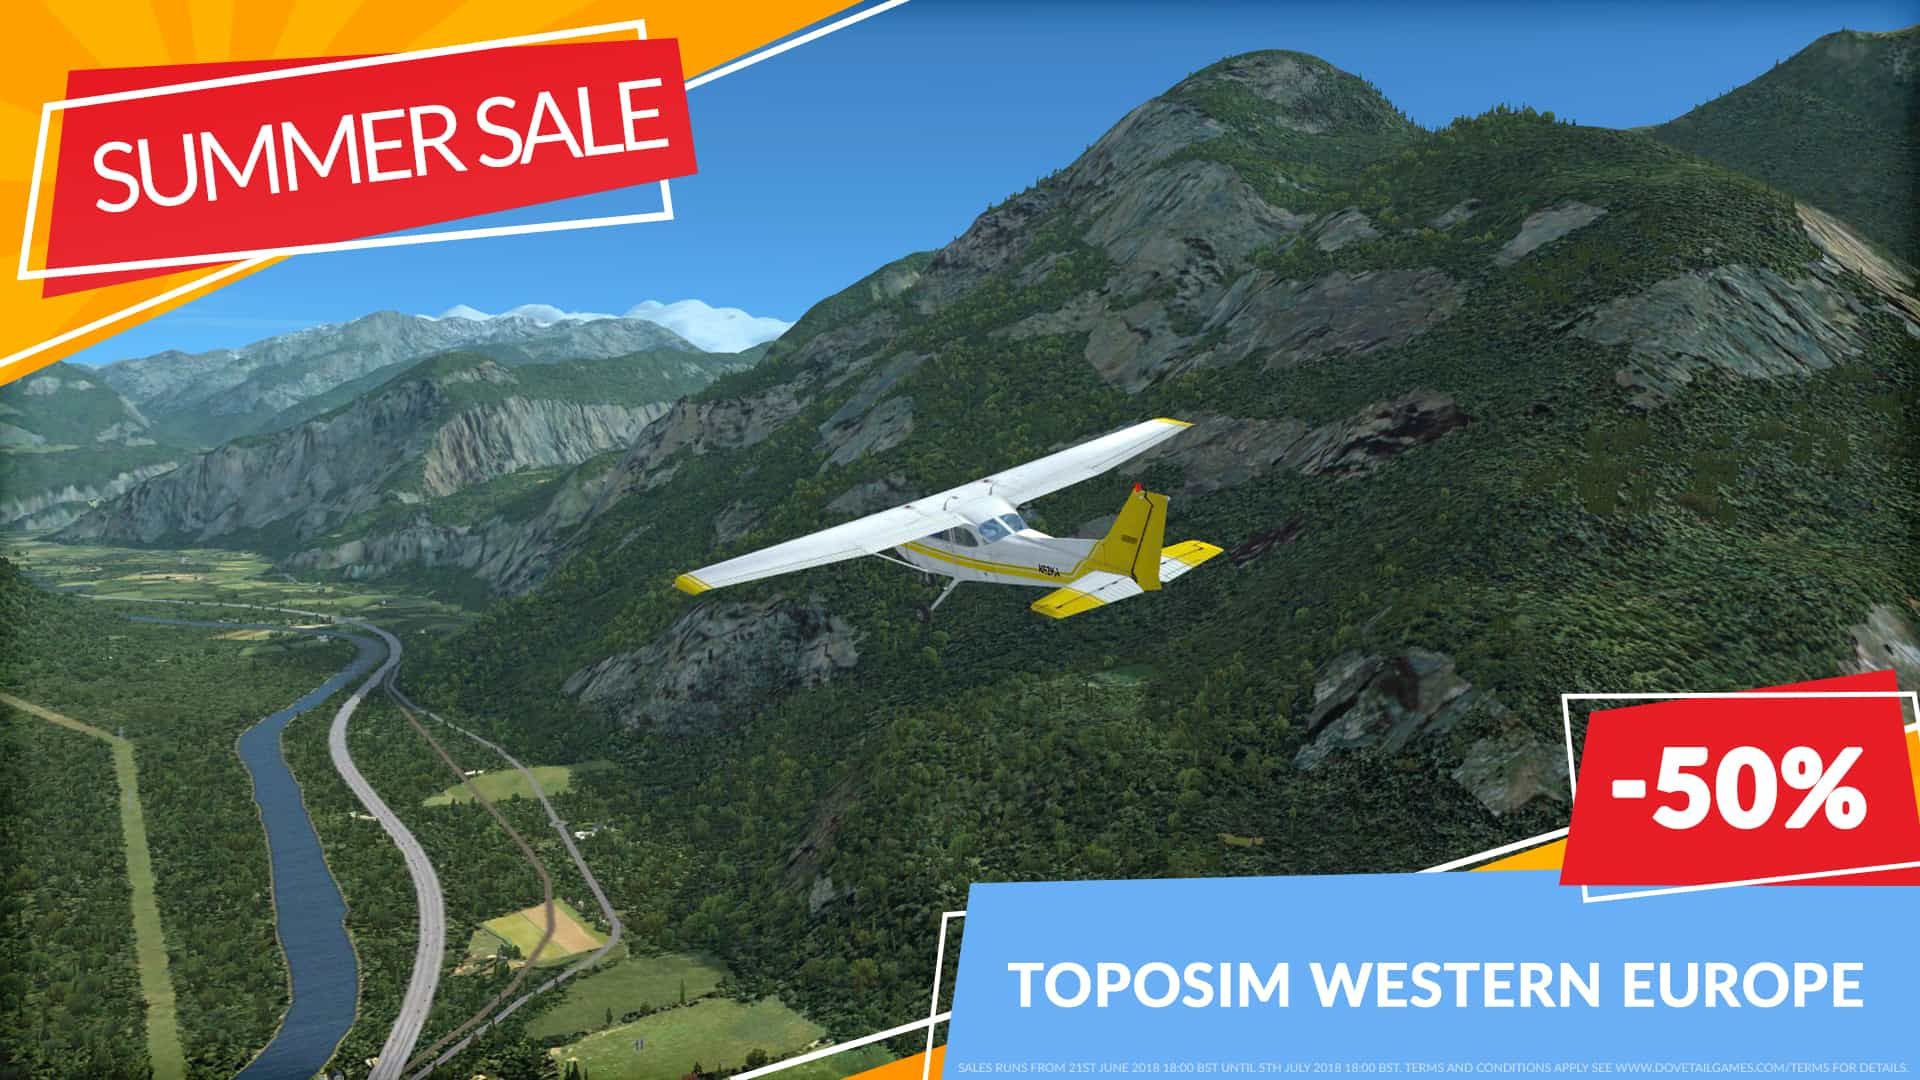 Toposim-Western-Europe